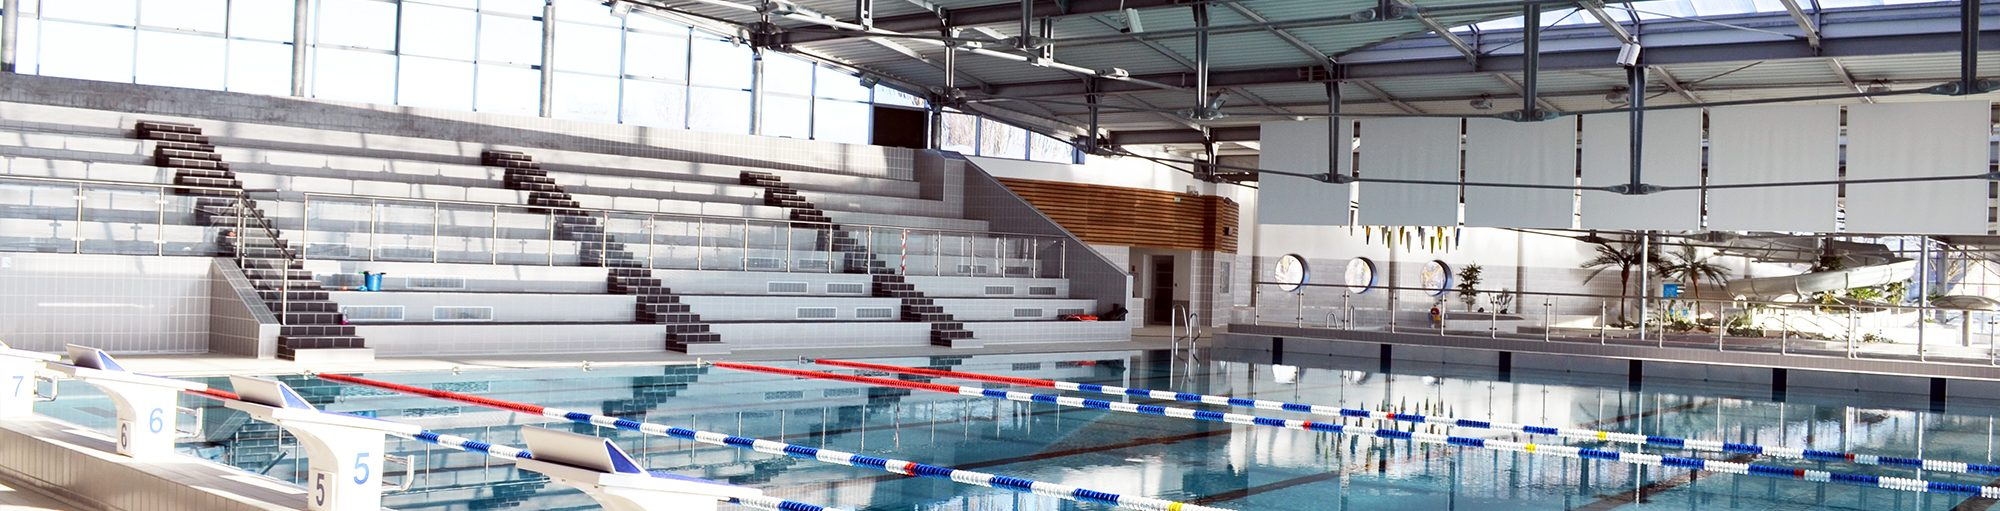 piscine-intérieure